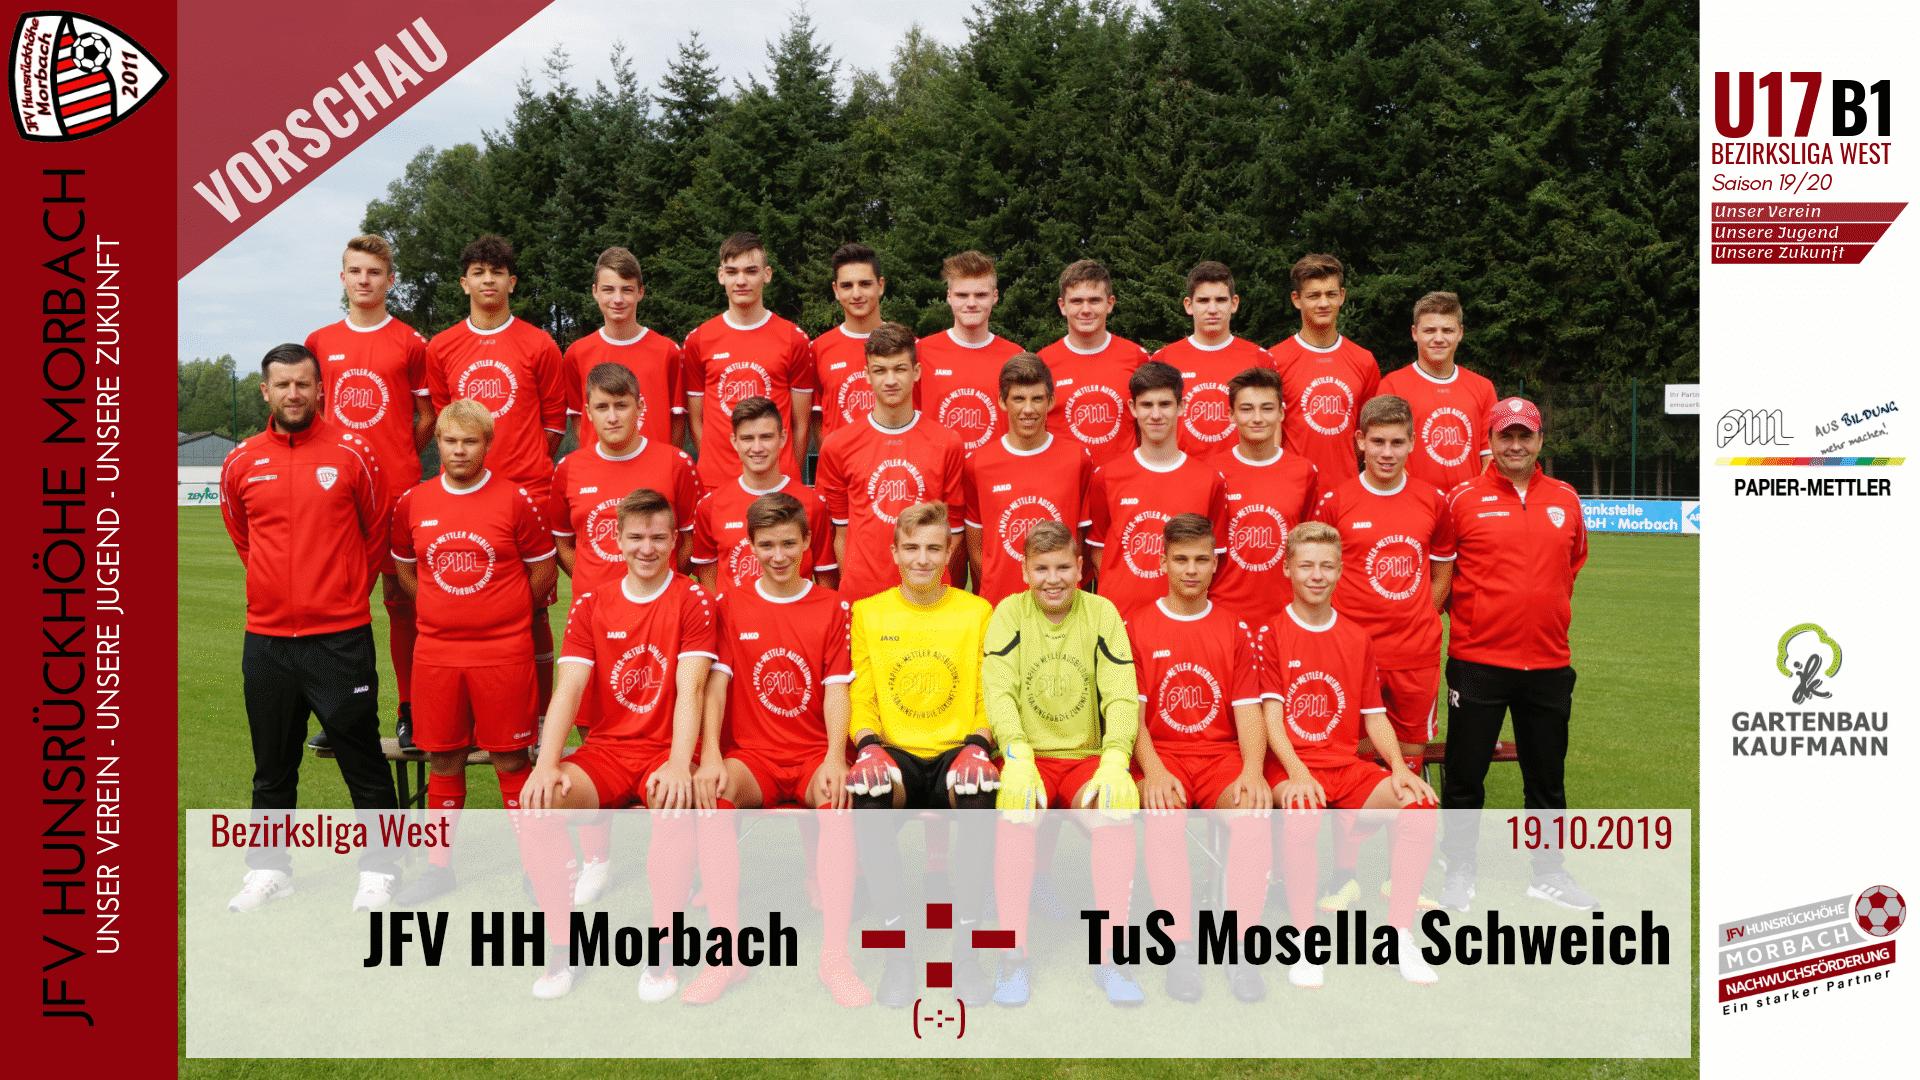 U17 B1: Vorbericht ~ JFV Hunsrückhöhe Morbach – TuS Mosella Schweich ~ Sa., 19.10.19 19:00 Uhr